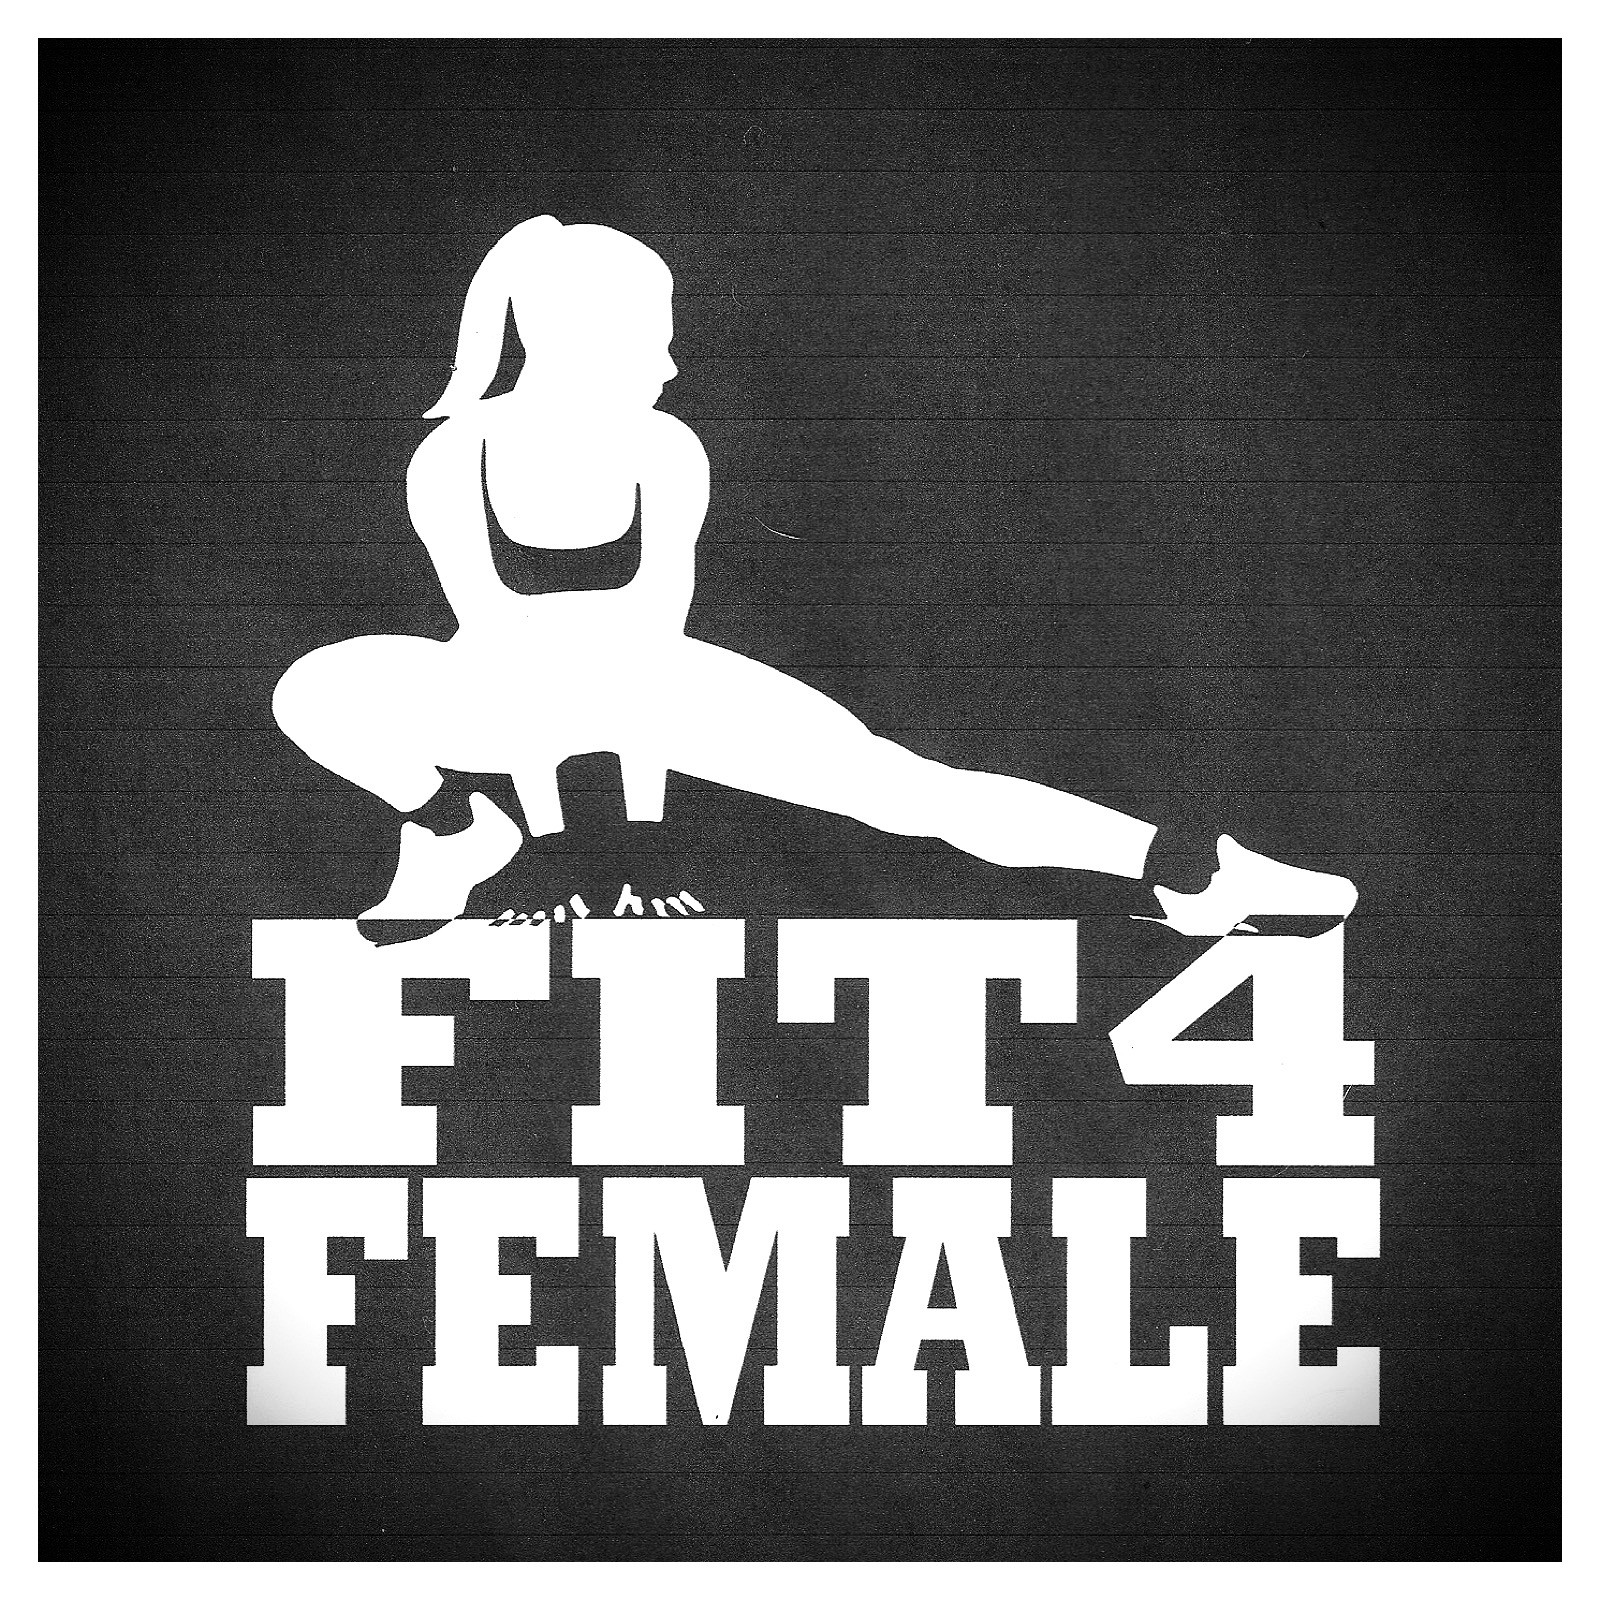 Fit 4 Female